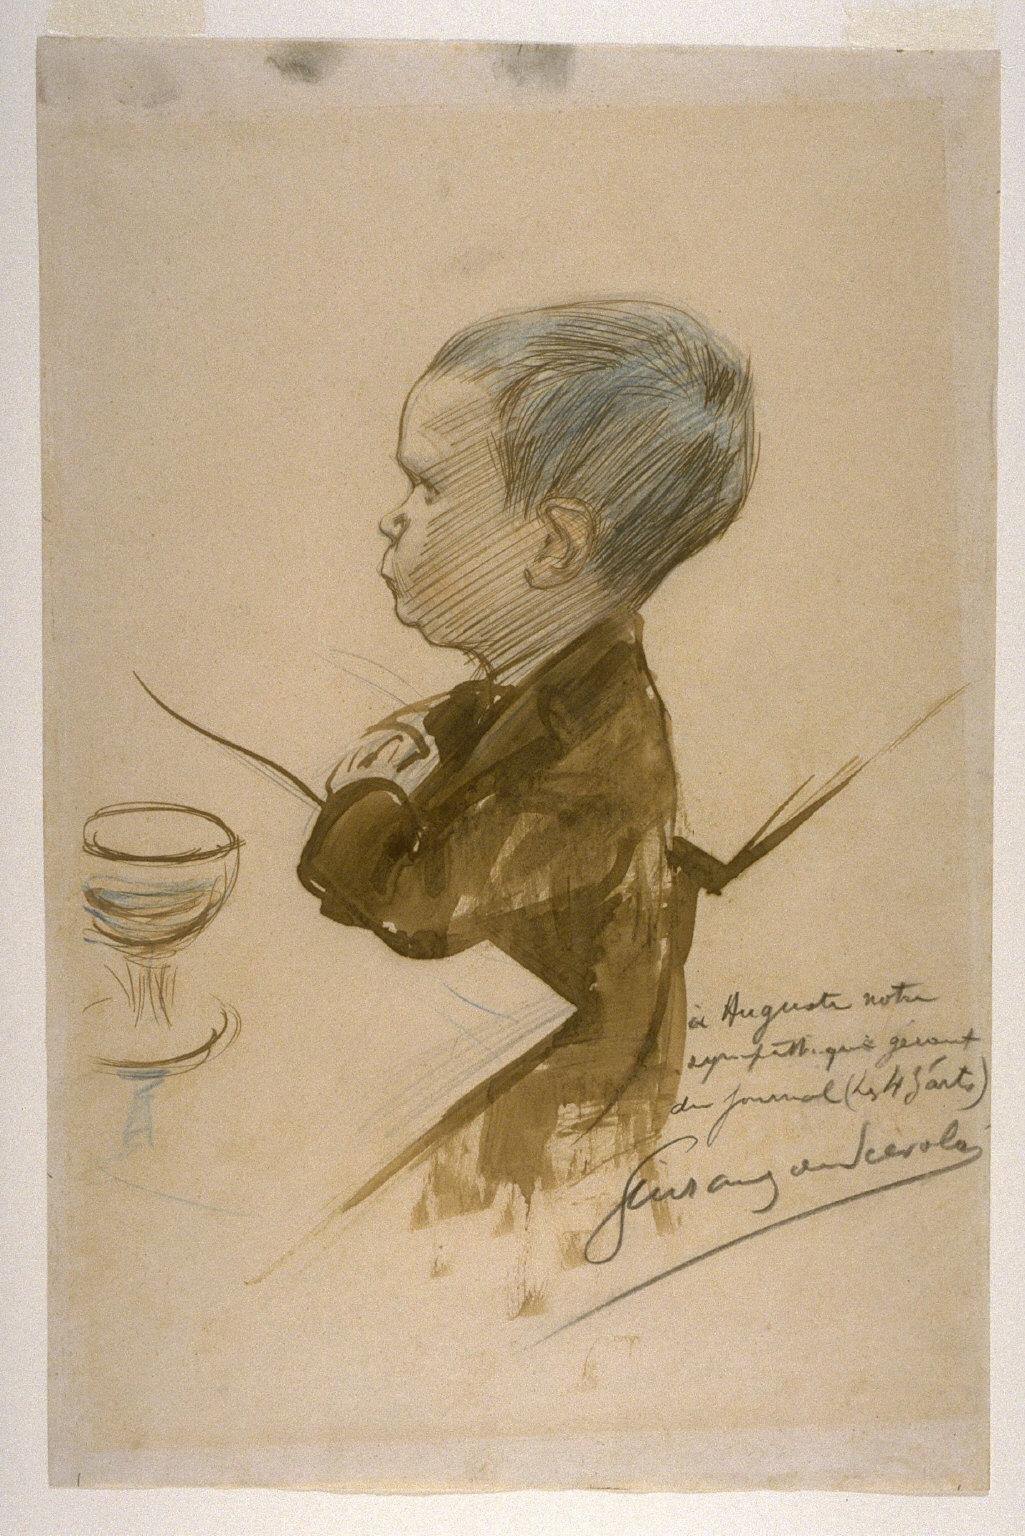 Auguste Tuaillon